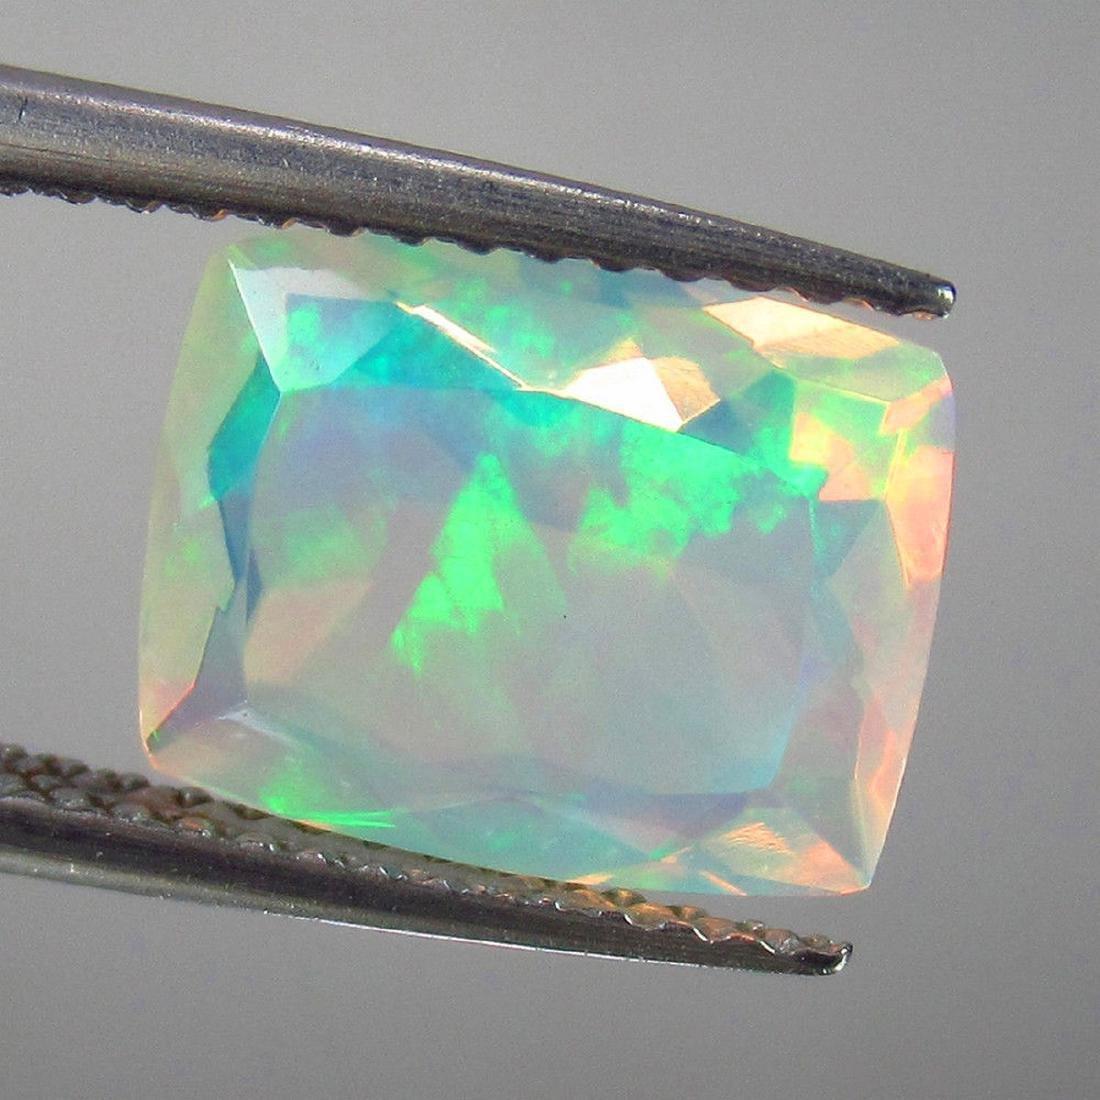 2.05 Carat Natural Loose Ethiopian Faceted Welo Opal